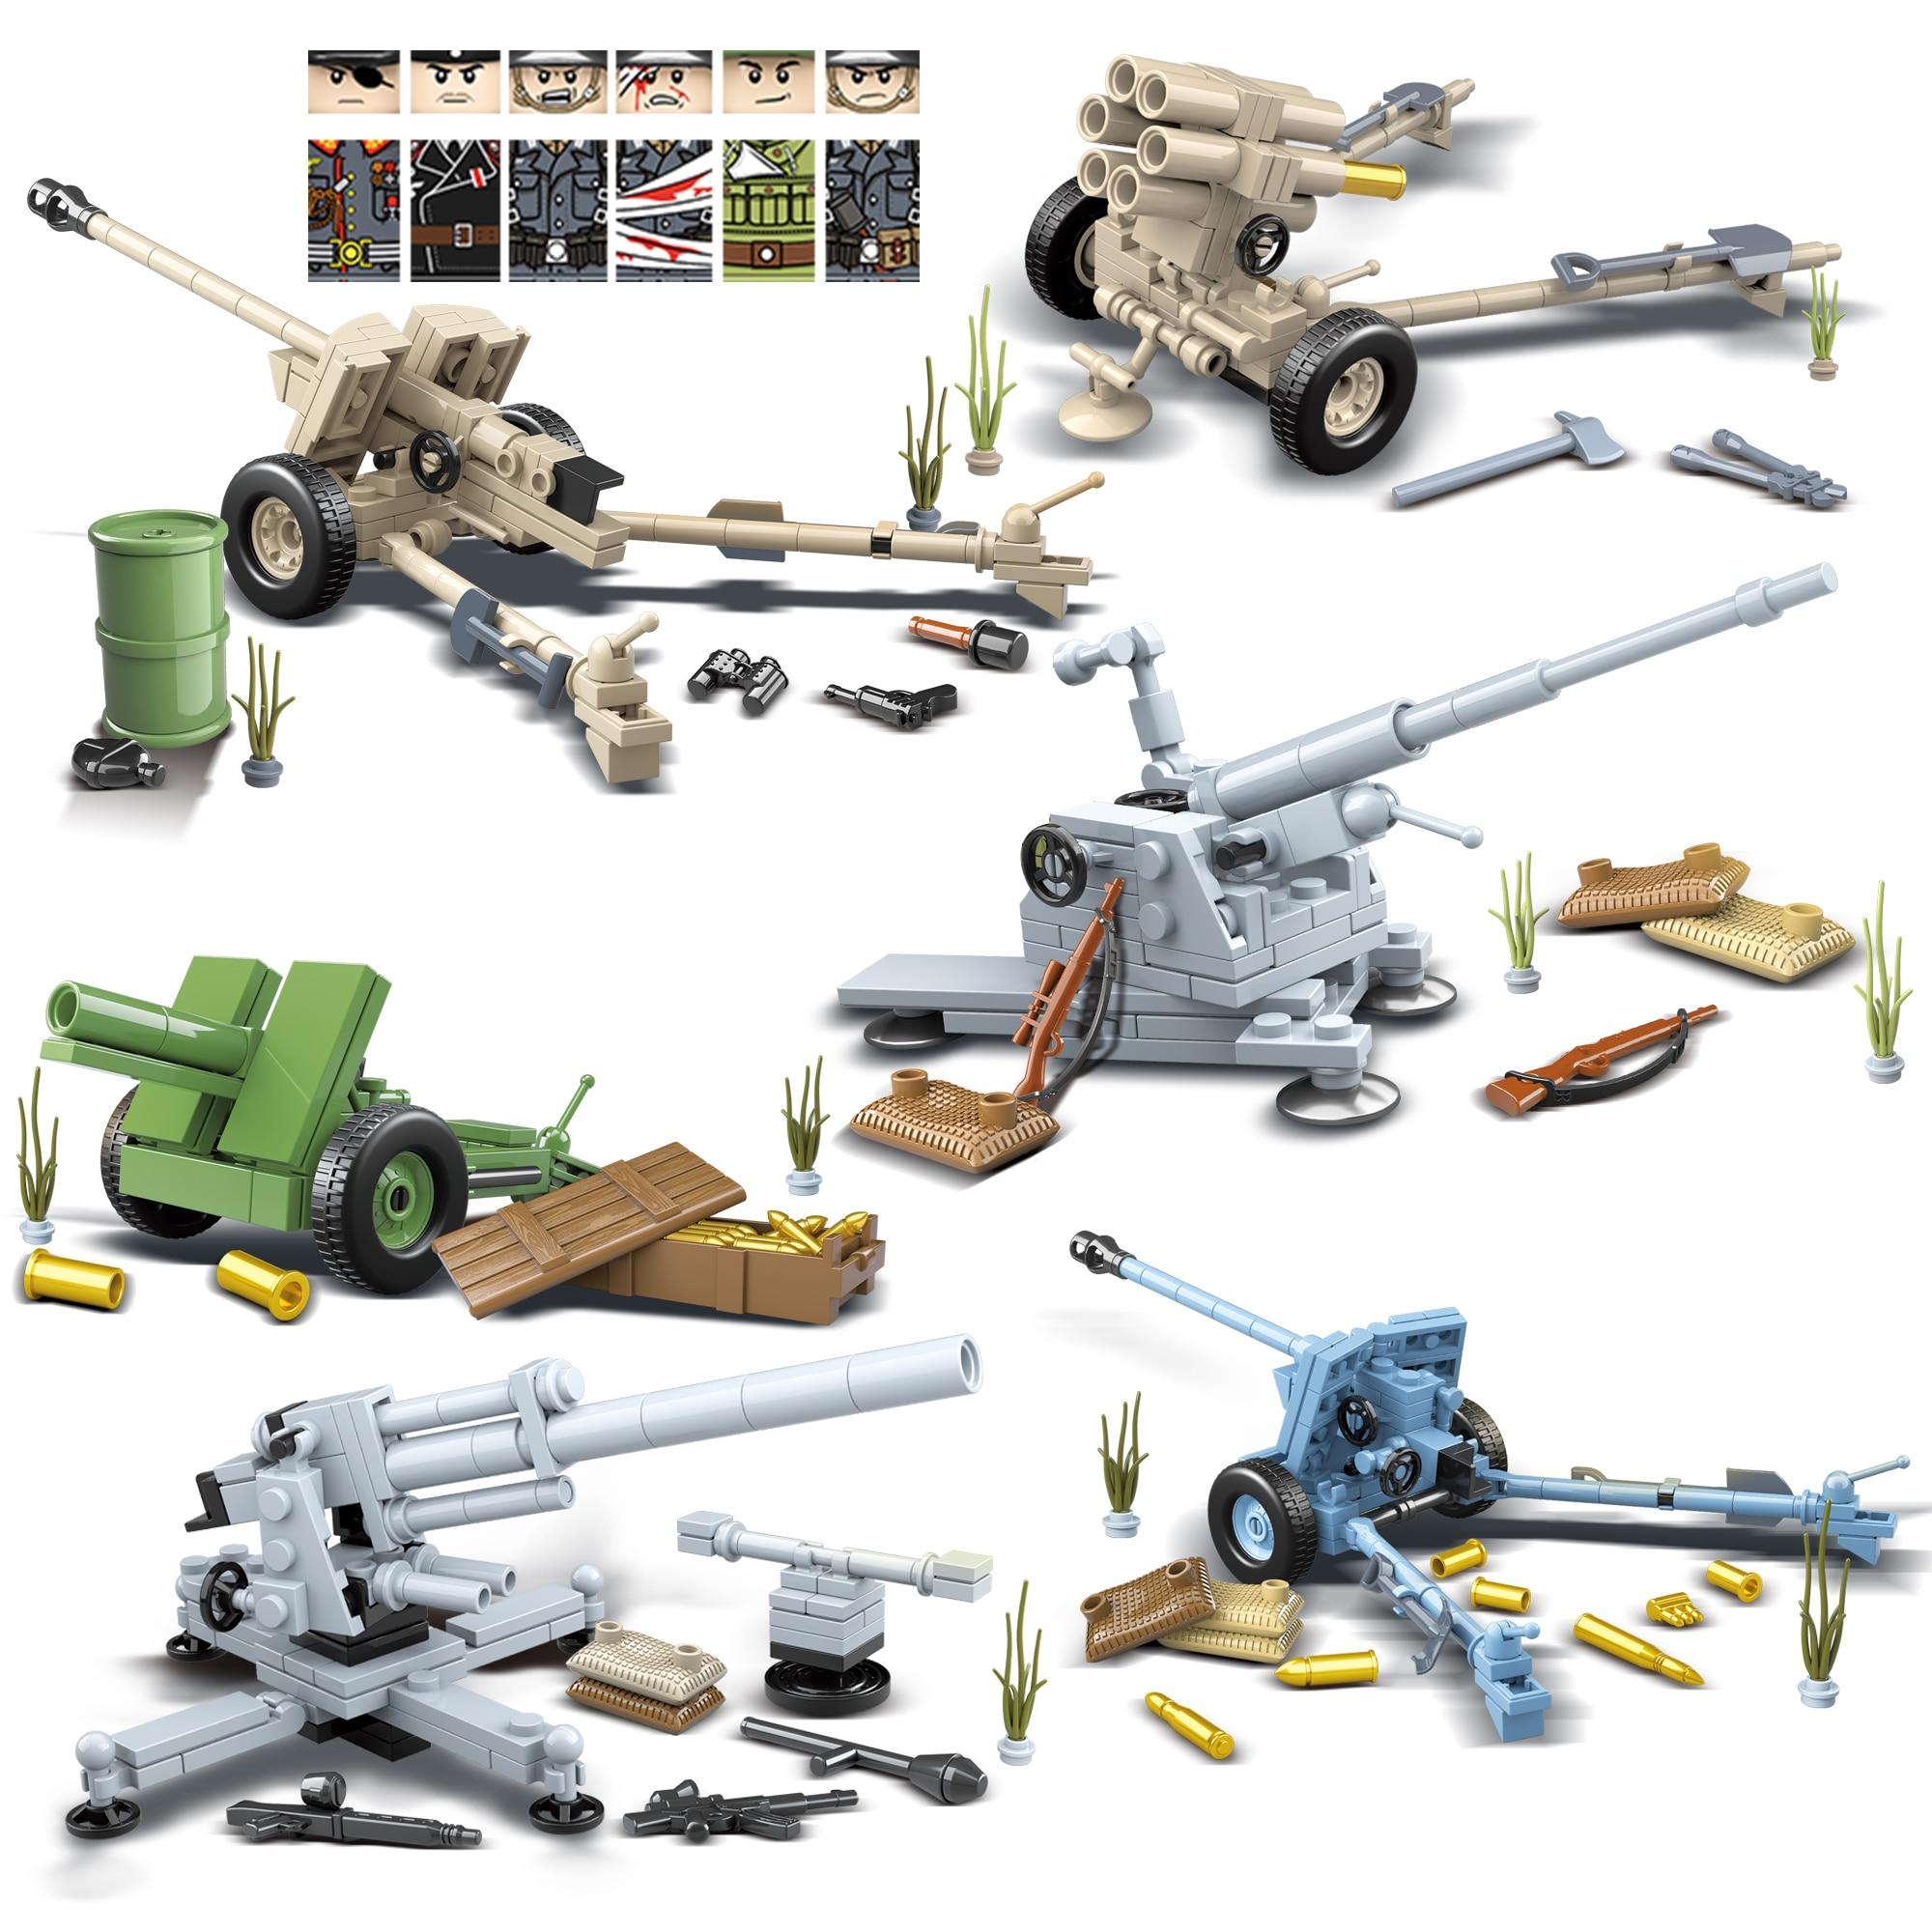 Armas militares de la Segunda Guerra Mundial de Alemania antitanque FlaK 18 2cm Flak30 Flakvierling con Minifigs Kids Juguetes de bloques de construcción